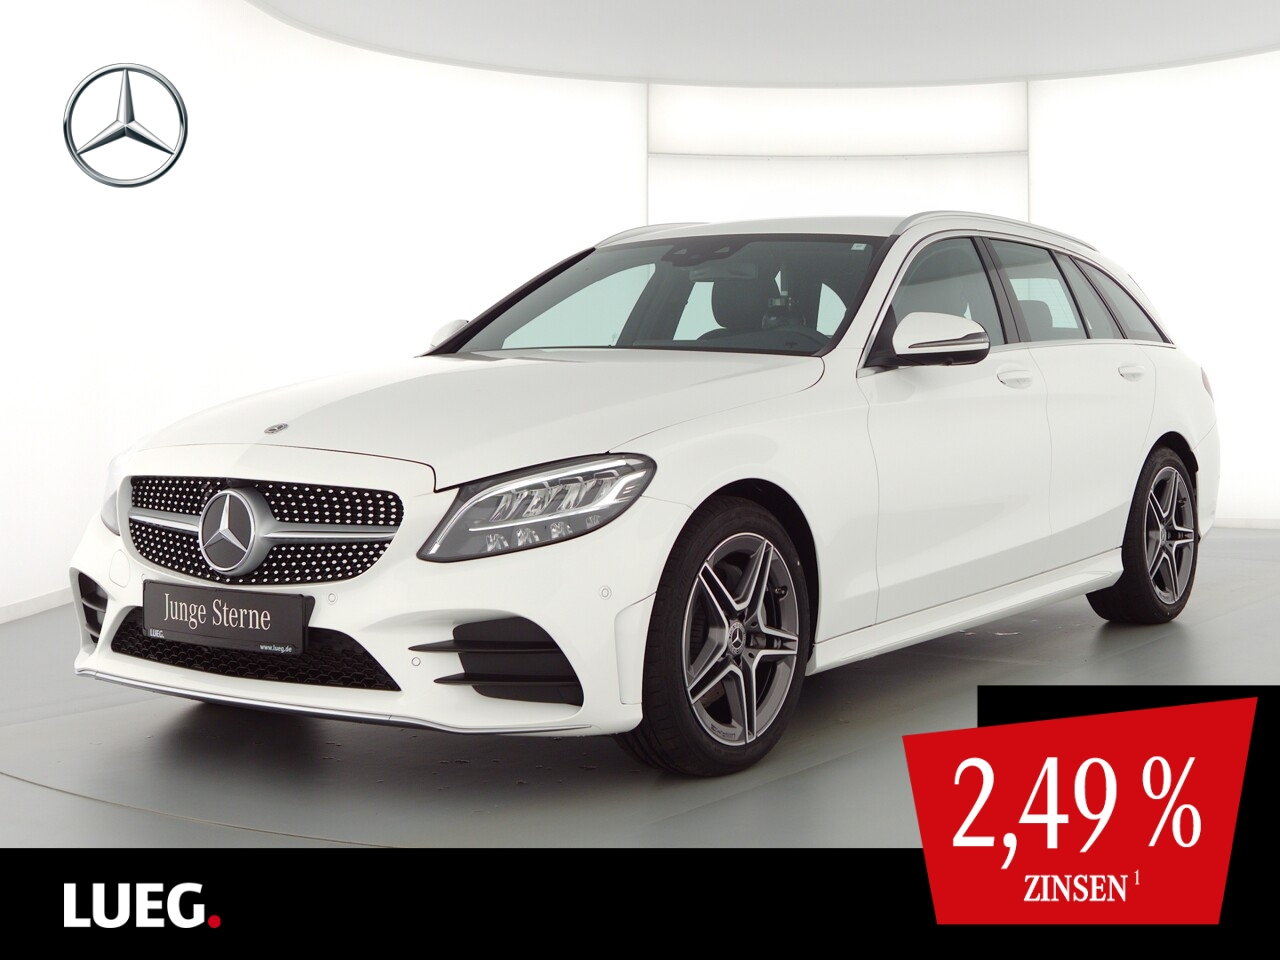 Mercedes-Benz C 220 d T AMG+COM+LED-HP+Sthzg+SpurPk+EHeck+360°, Jahr 2020, Diesel